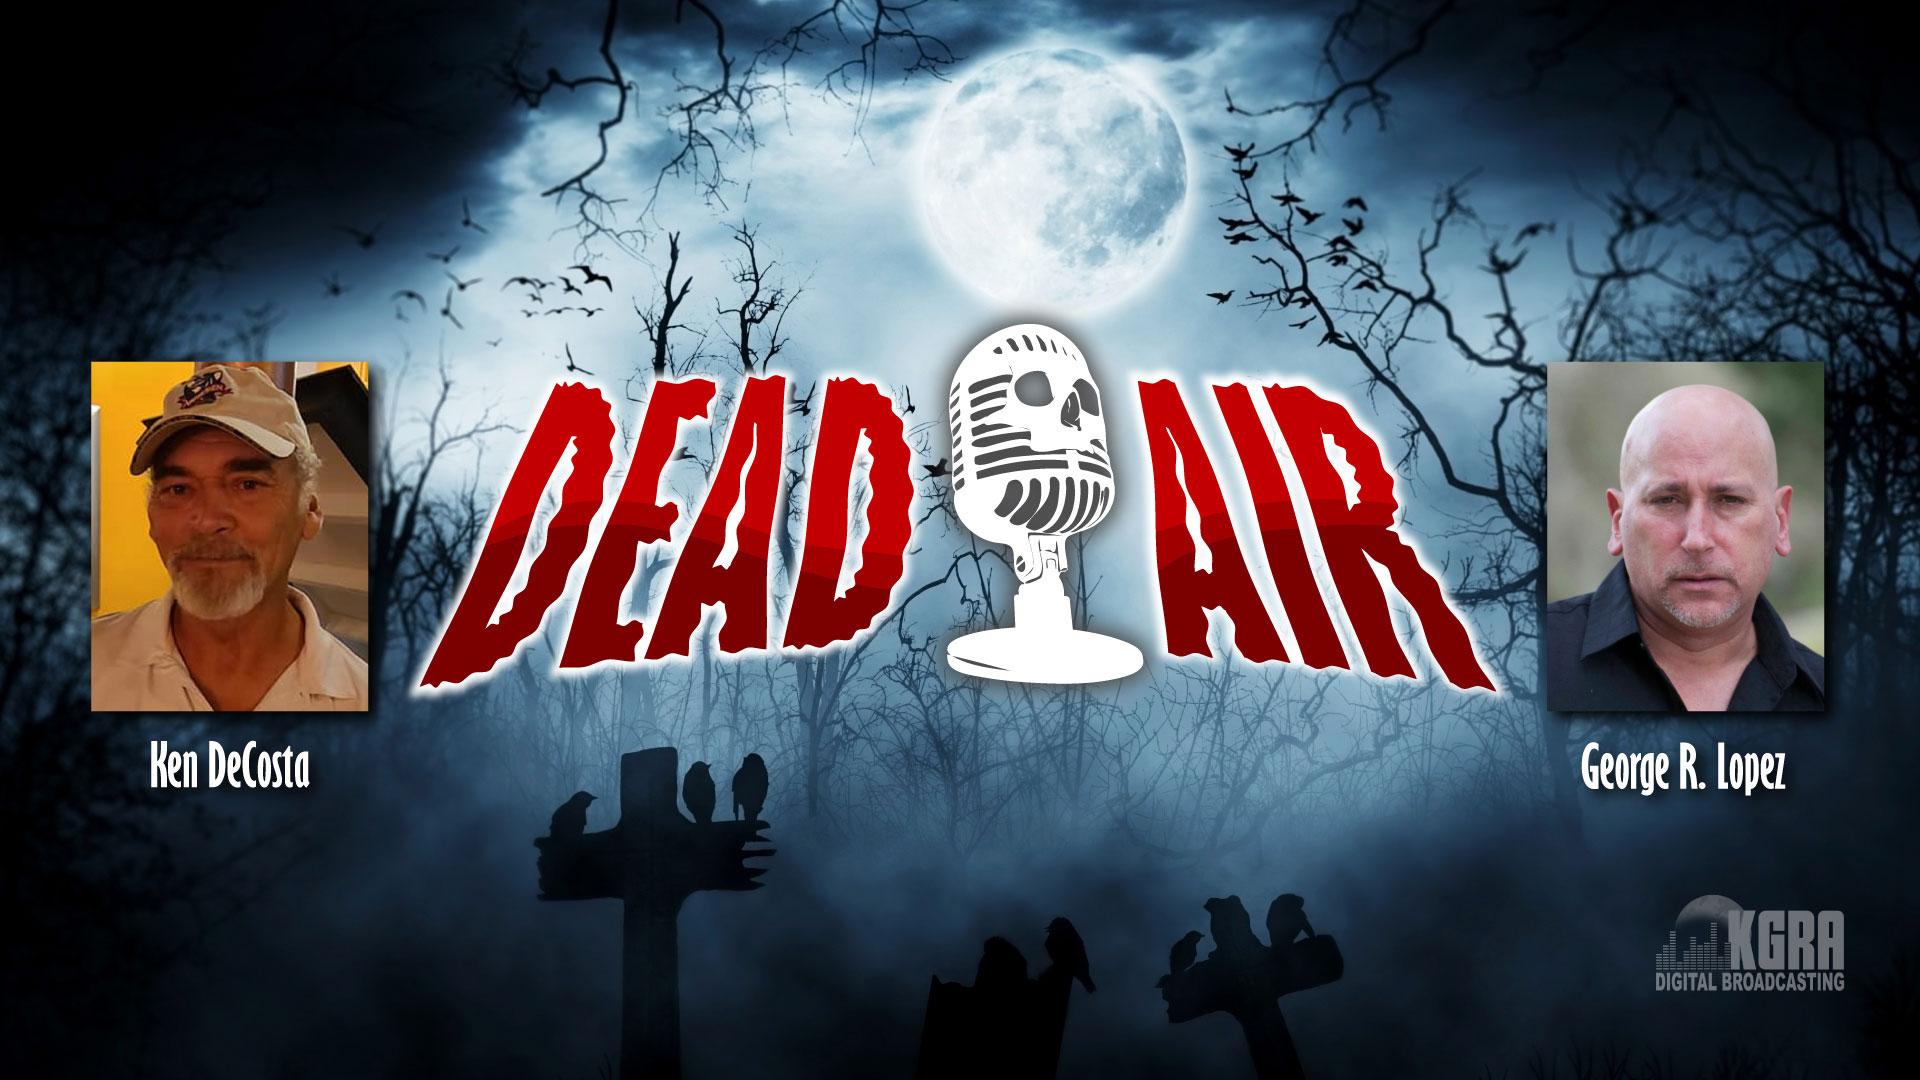 Dead Air Show - KGRA Digital Broadcasting